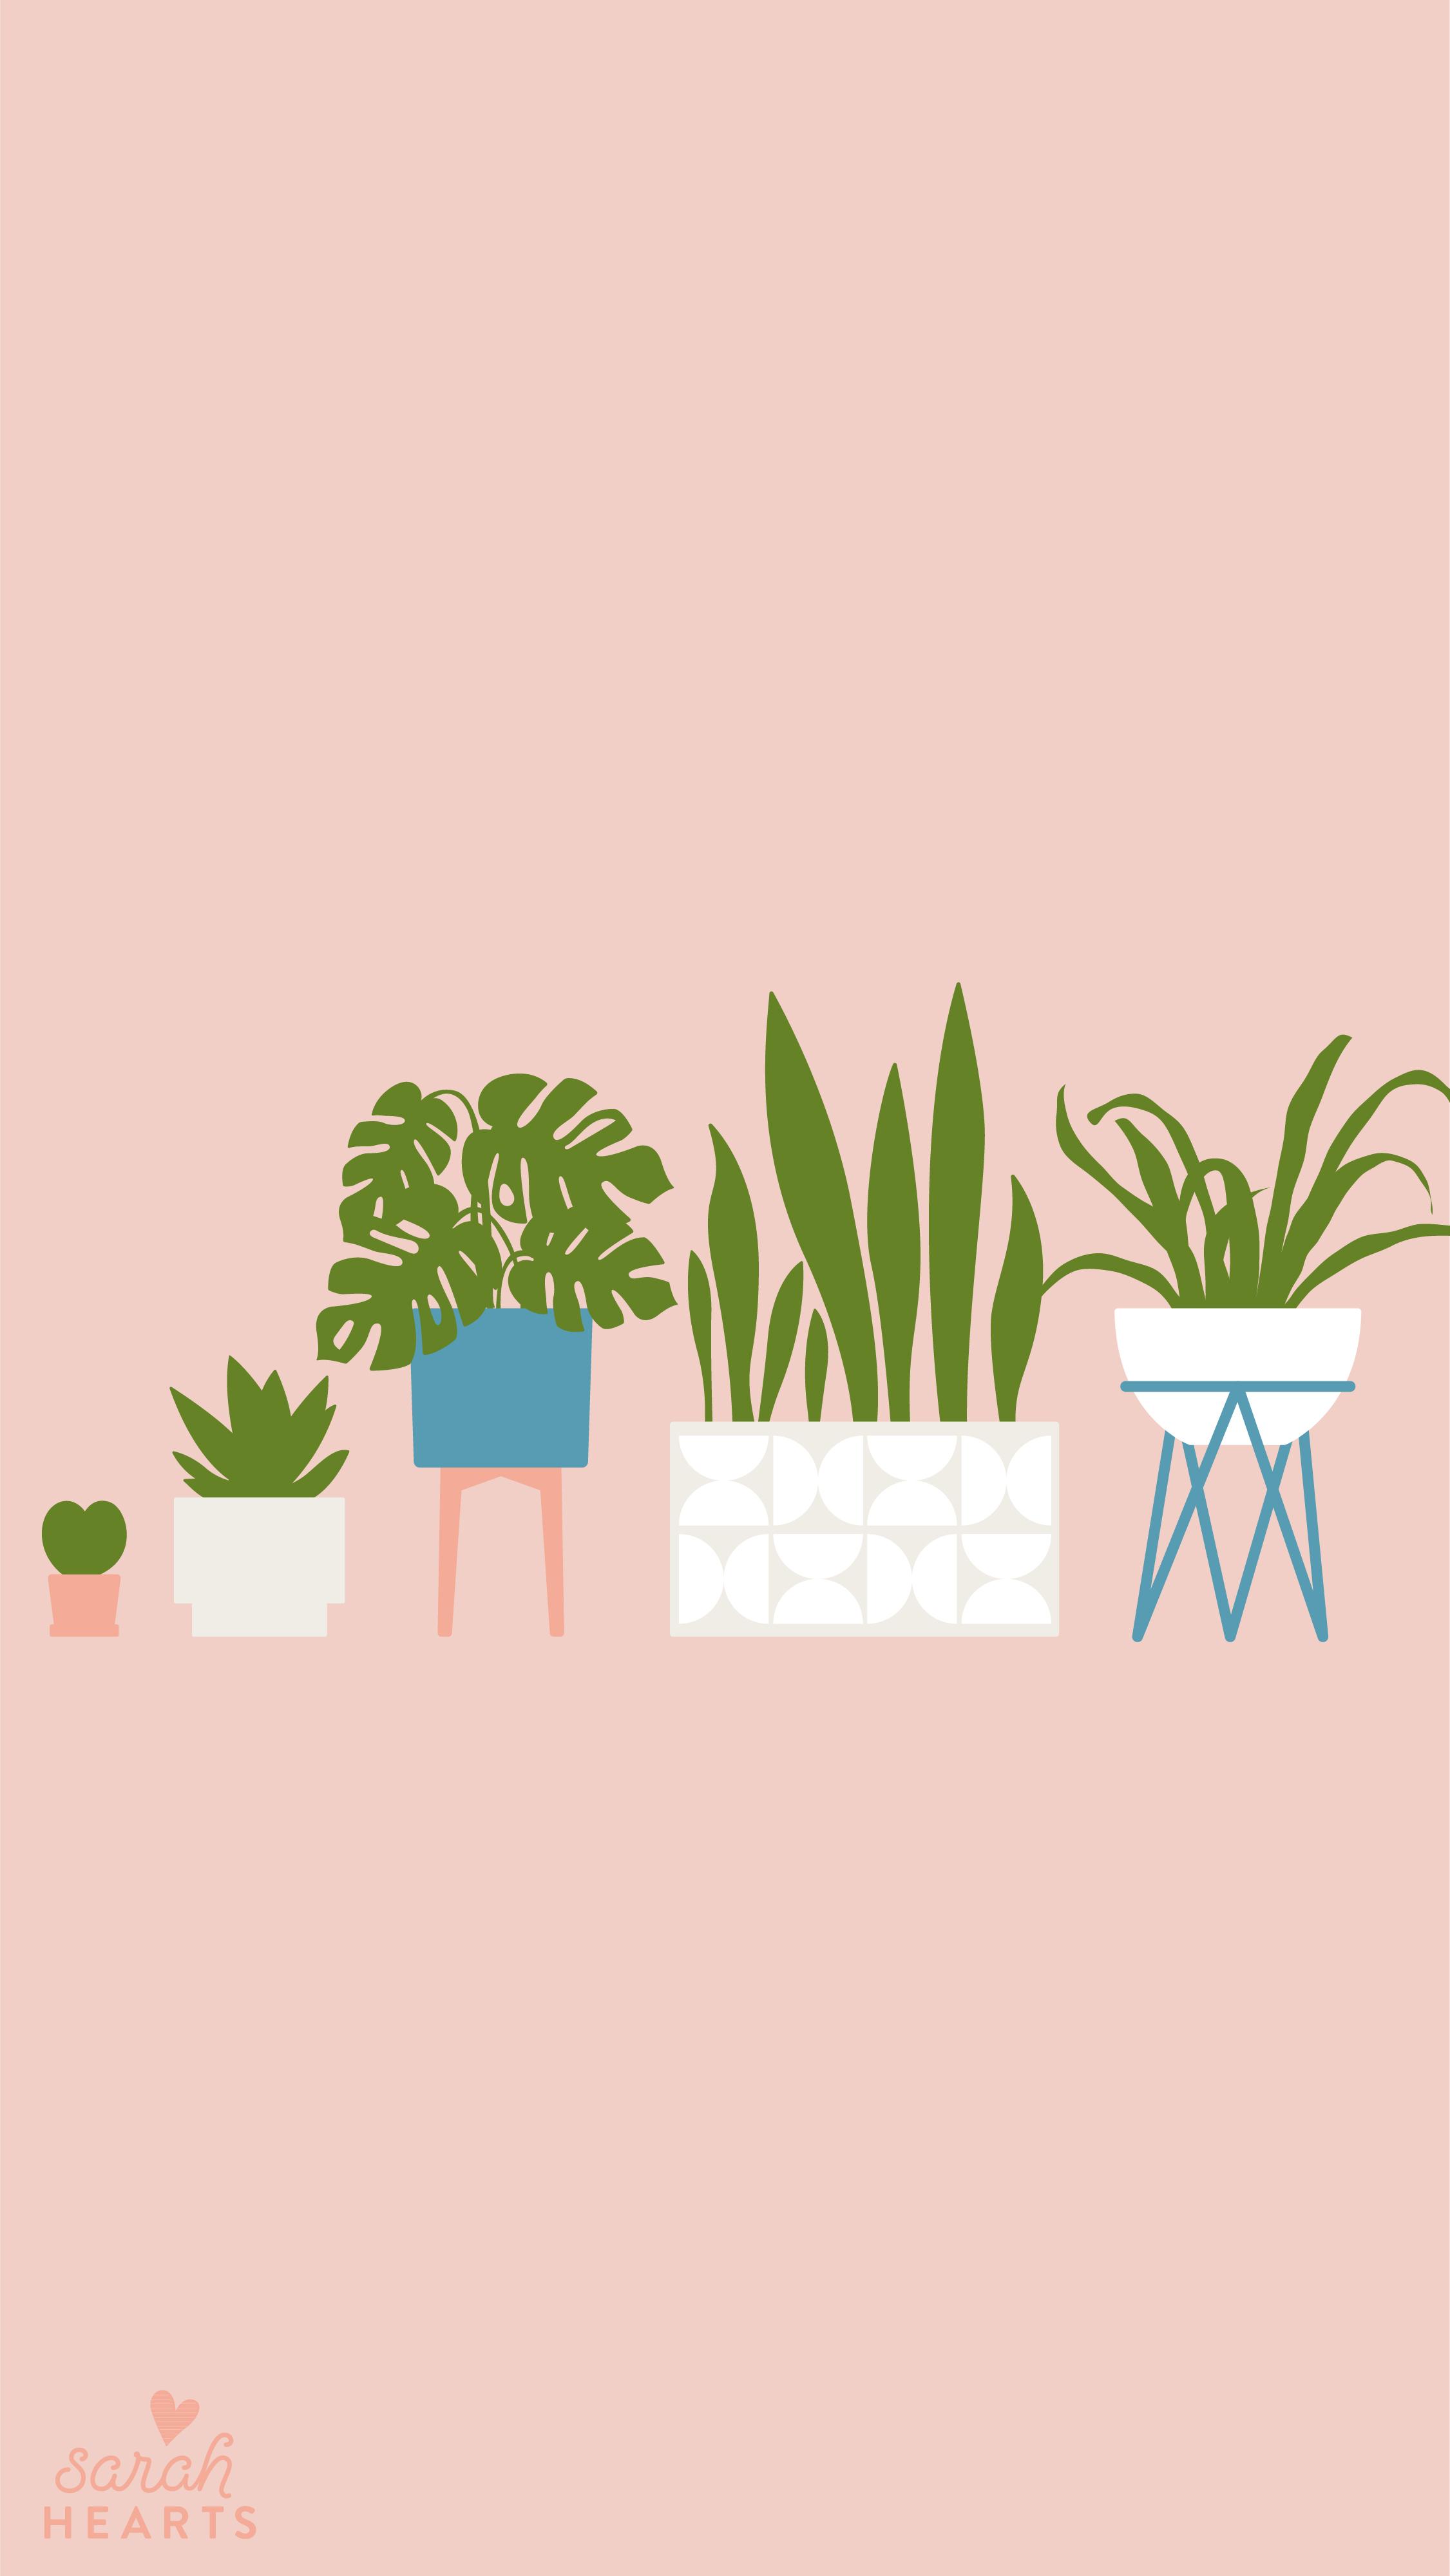 Minimalist Quote Wallpaper House Plant August 2019 Calendar Wallpaper Sarah Hearts